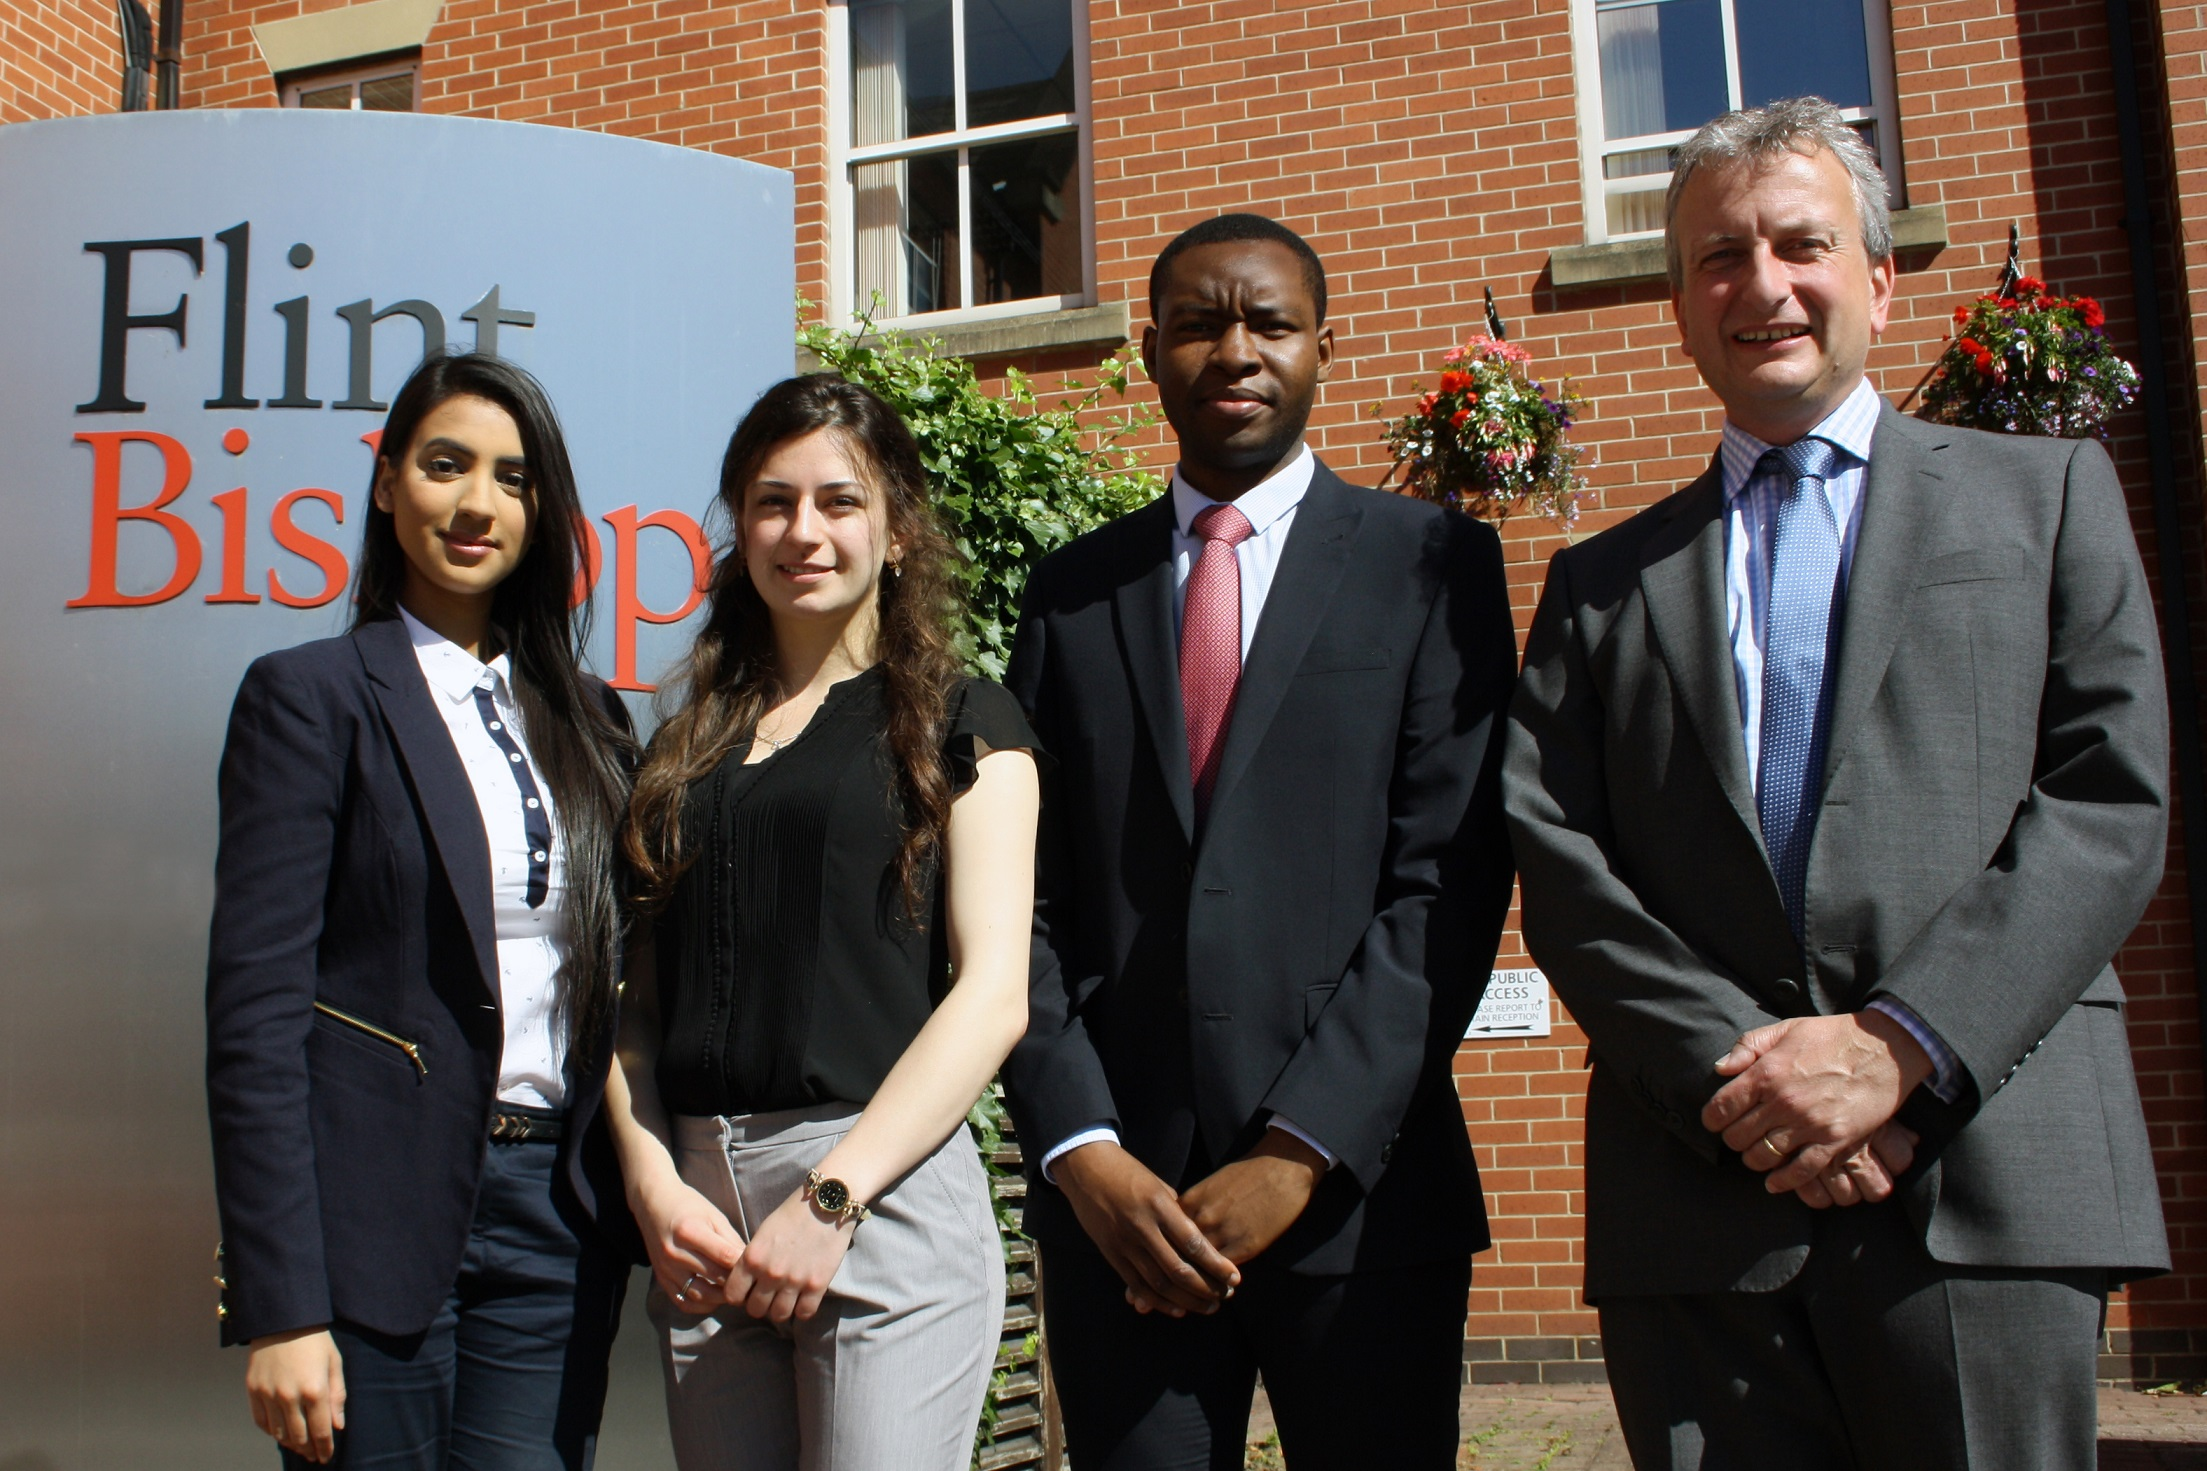 From left to right: Davinder Kooner, Adina Martin, Mzwandile Mabhena & Andrew Cochrane, Senior Partner and Head of Licensing at Flint Bishop